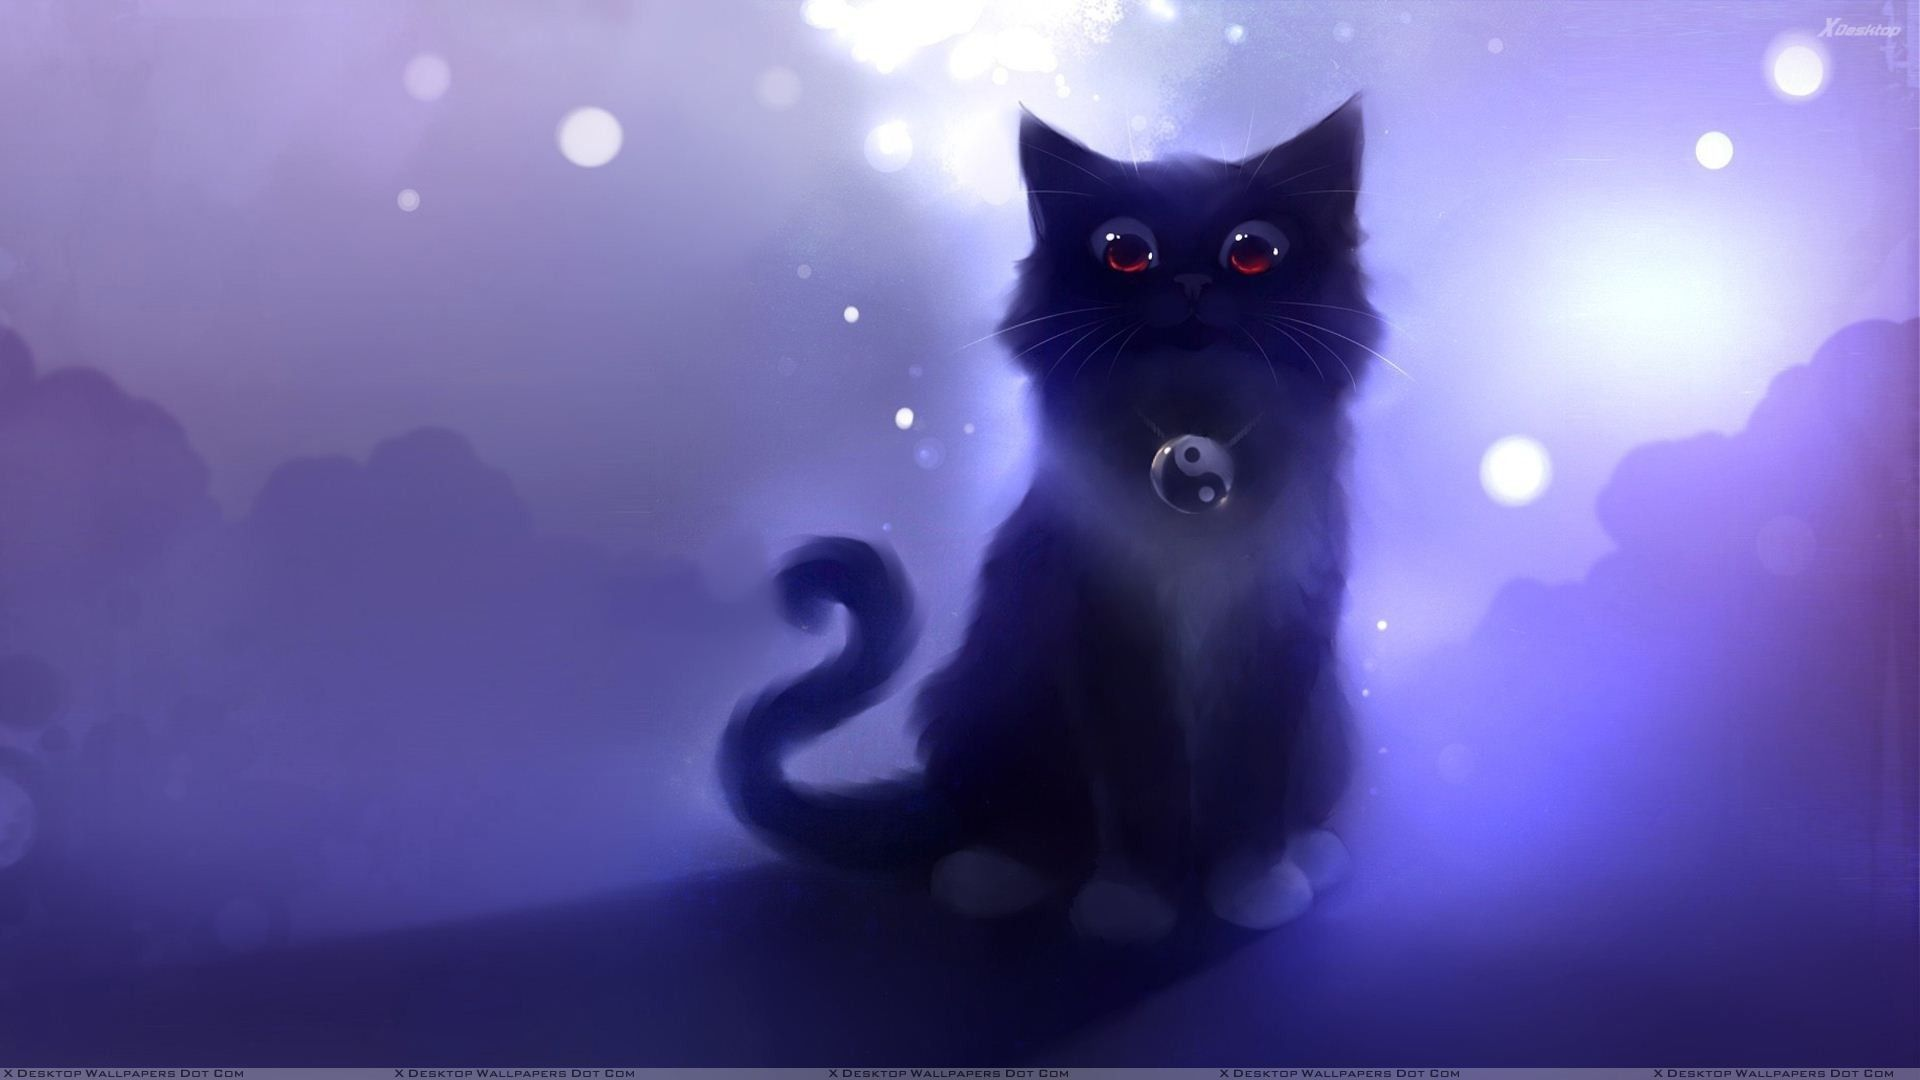 Cartoon Cat Wallpapers Top Free Cartoon Cat Backgrounds